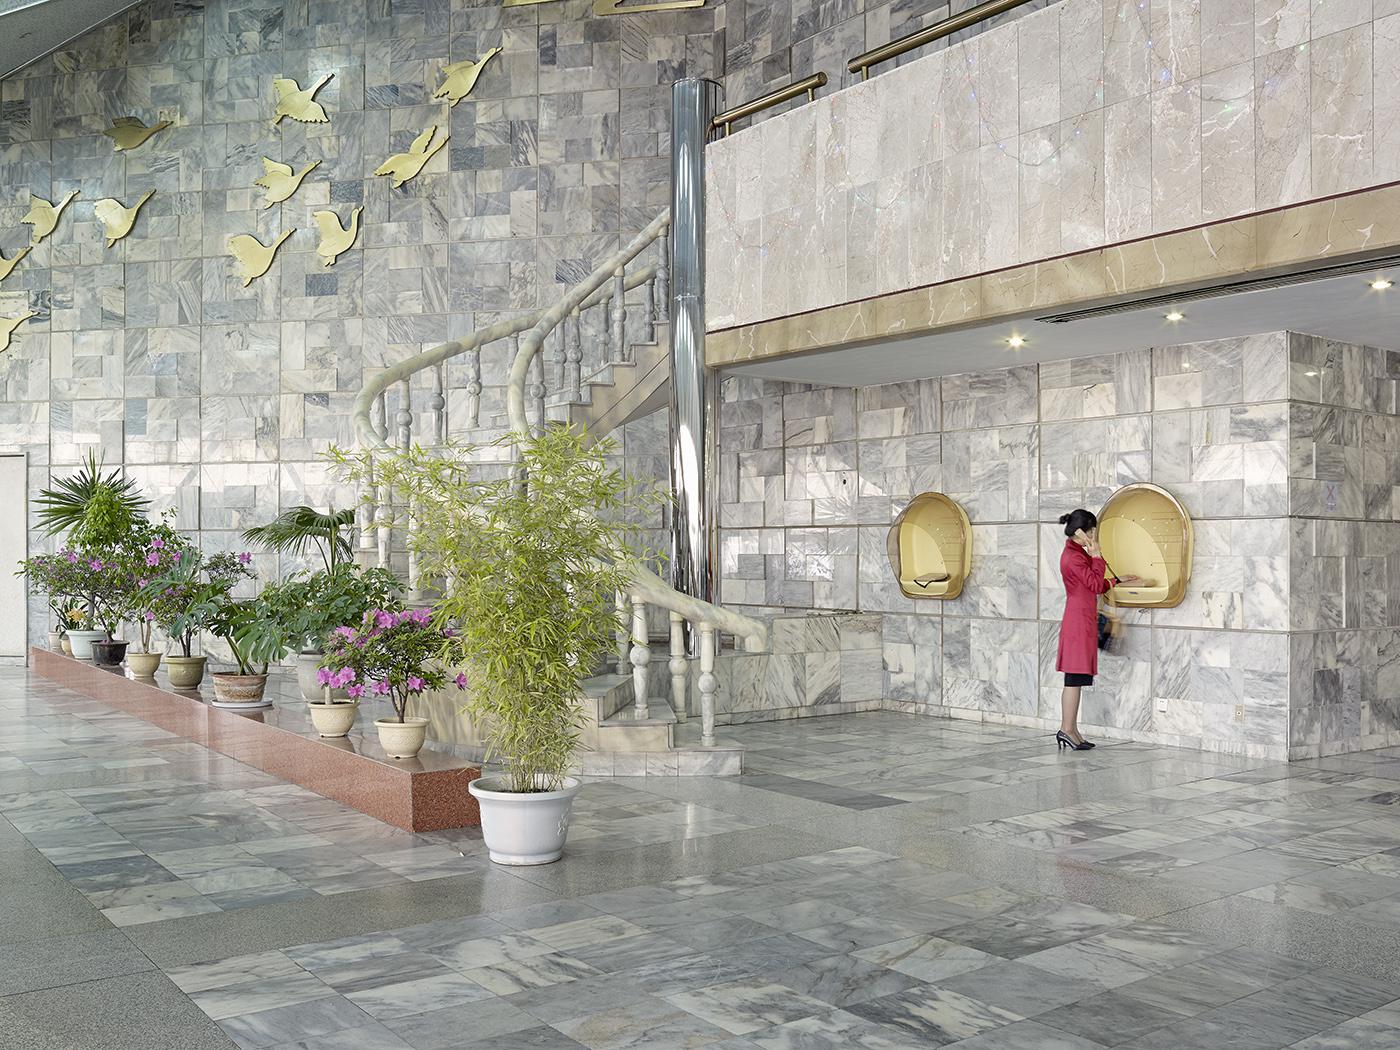 Yanggakdo Hotel on Yanggak Island, Pyongyang rises to 47-storeys.